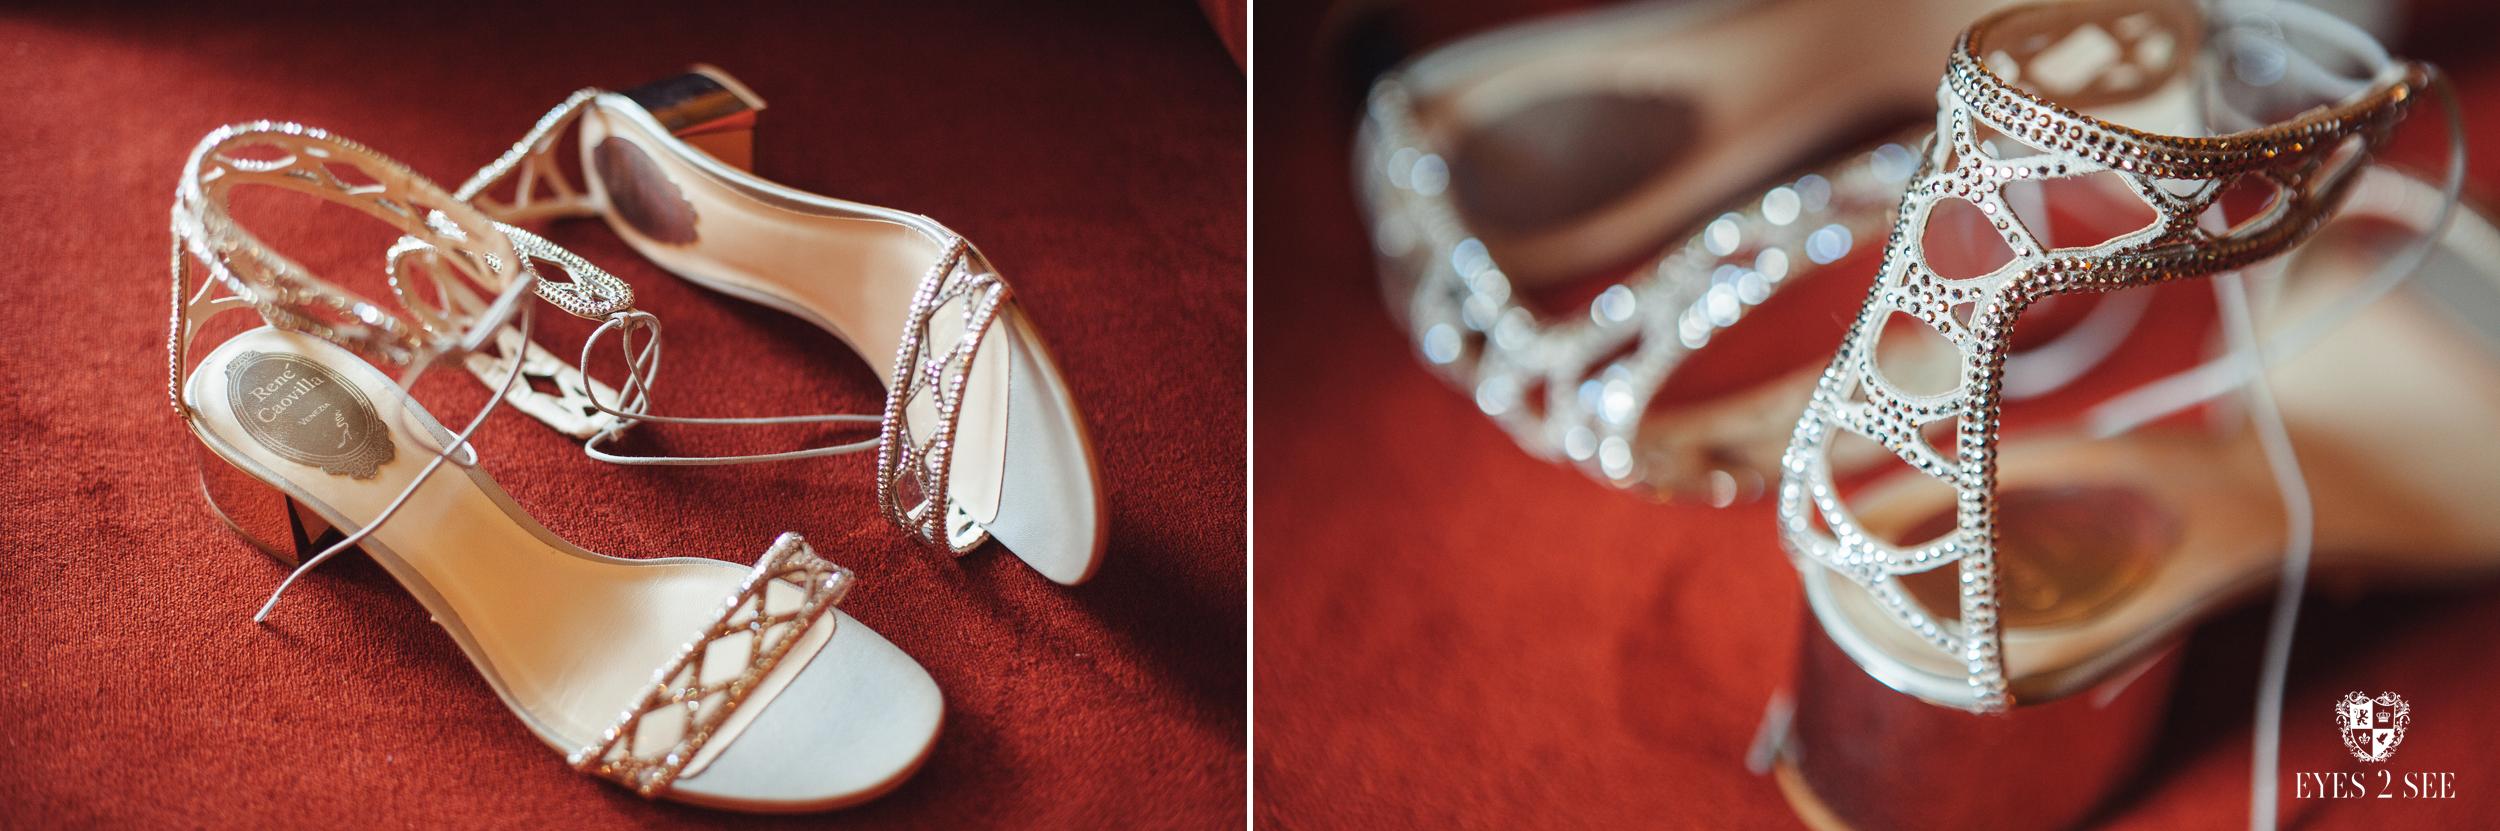 Yongrok_Jeanne_Wedding_Photography007.jpg